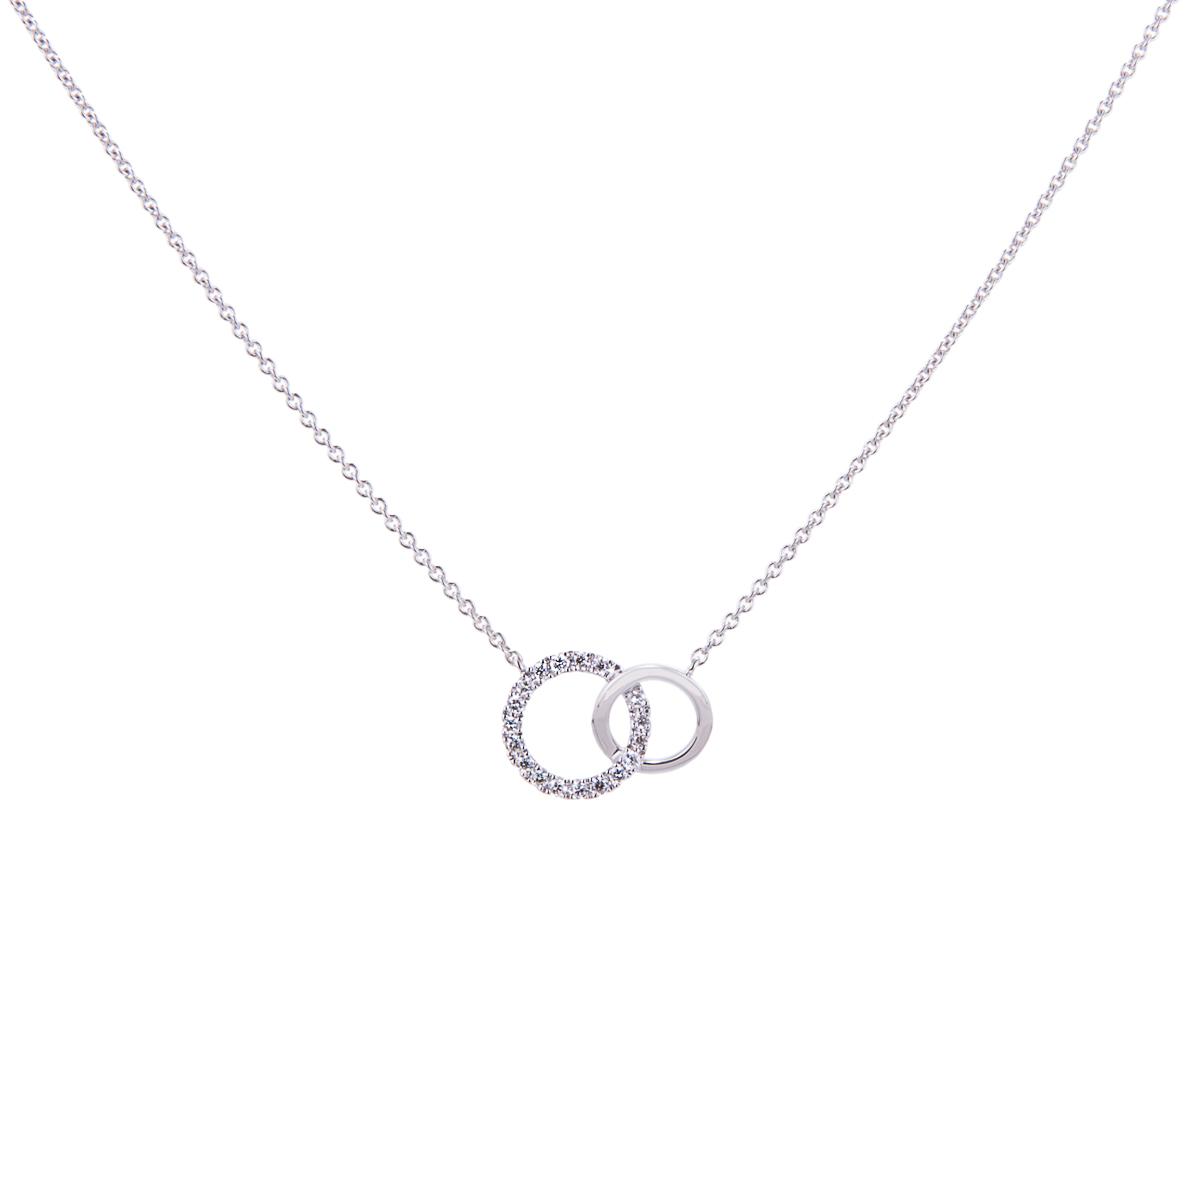 18ct-white-gold-diamond-pendant-hancocks-manchester